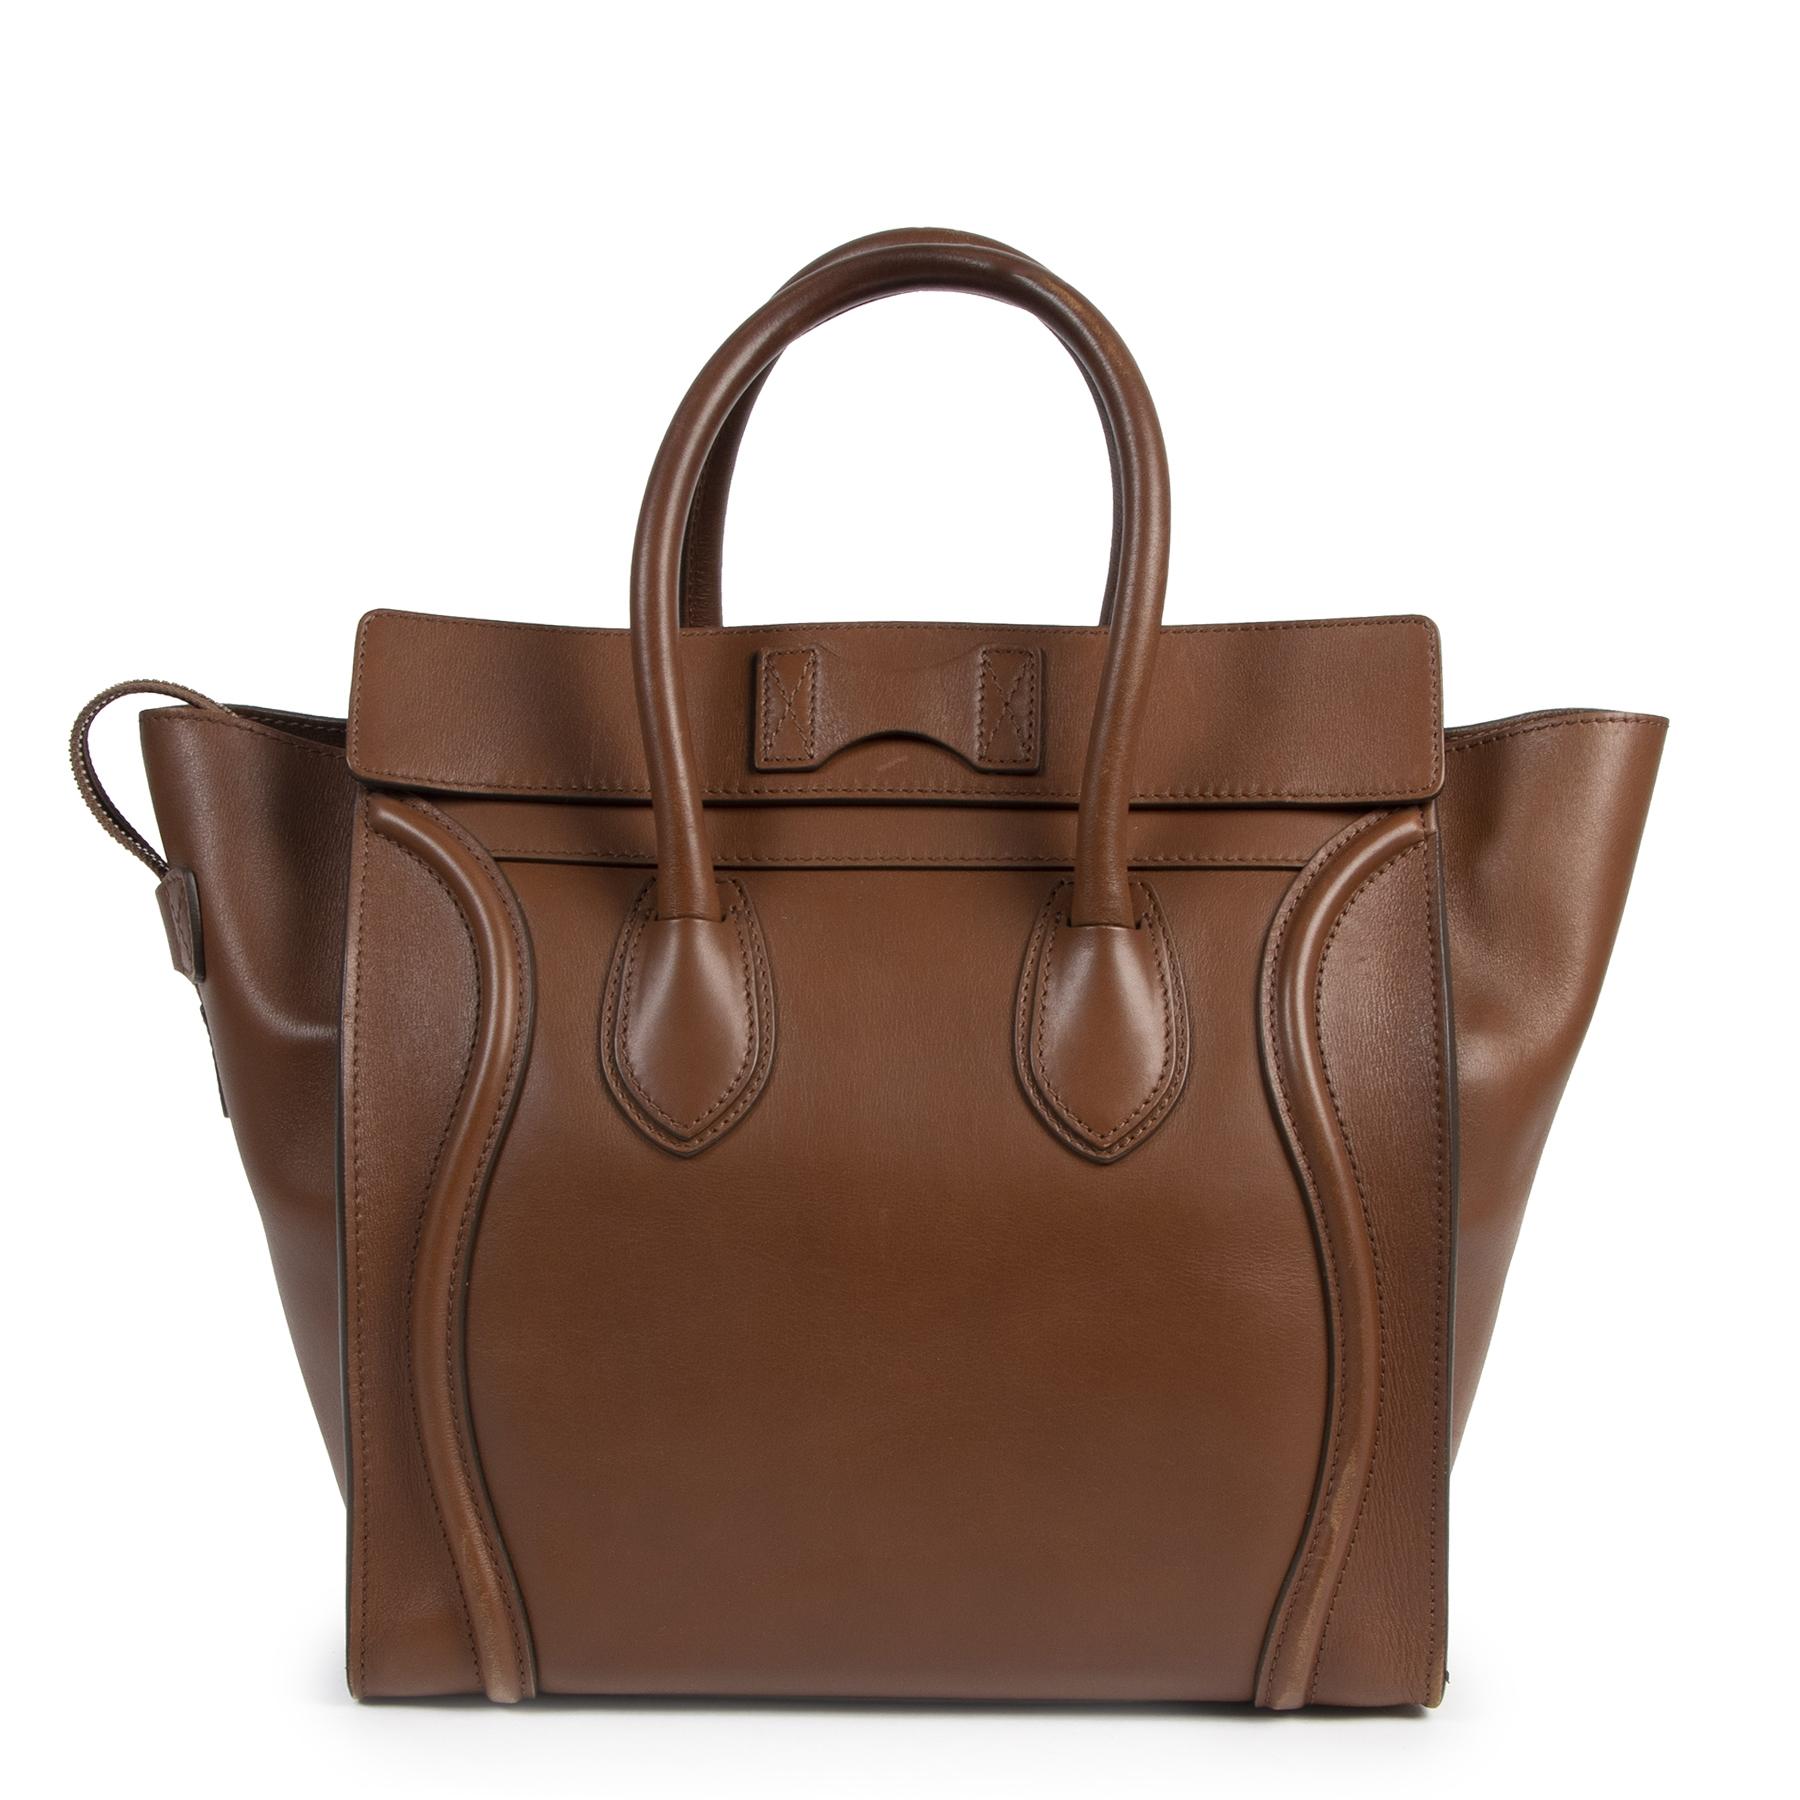 Céline Cognac Mini Luggage Tote